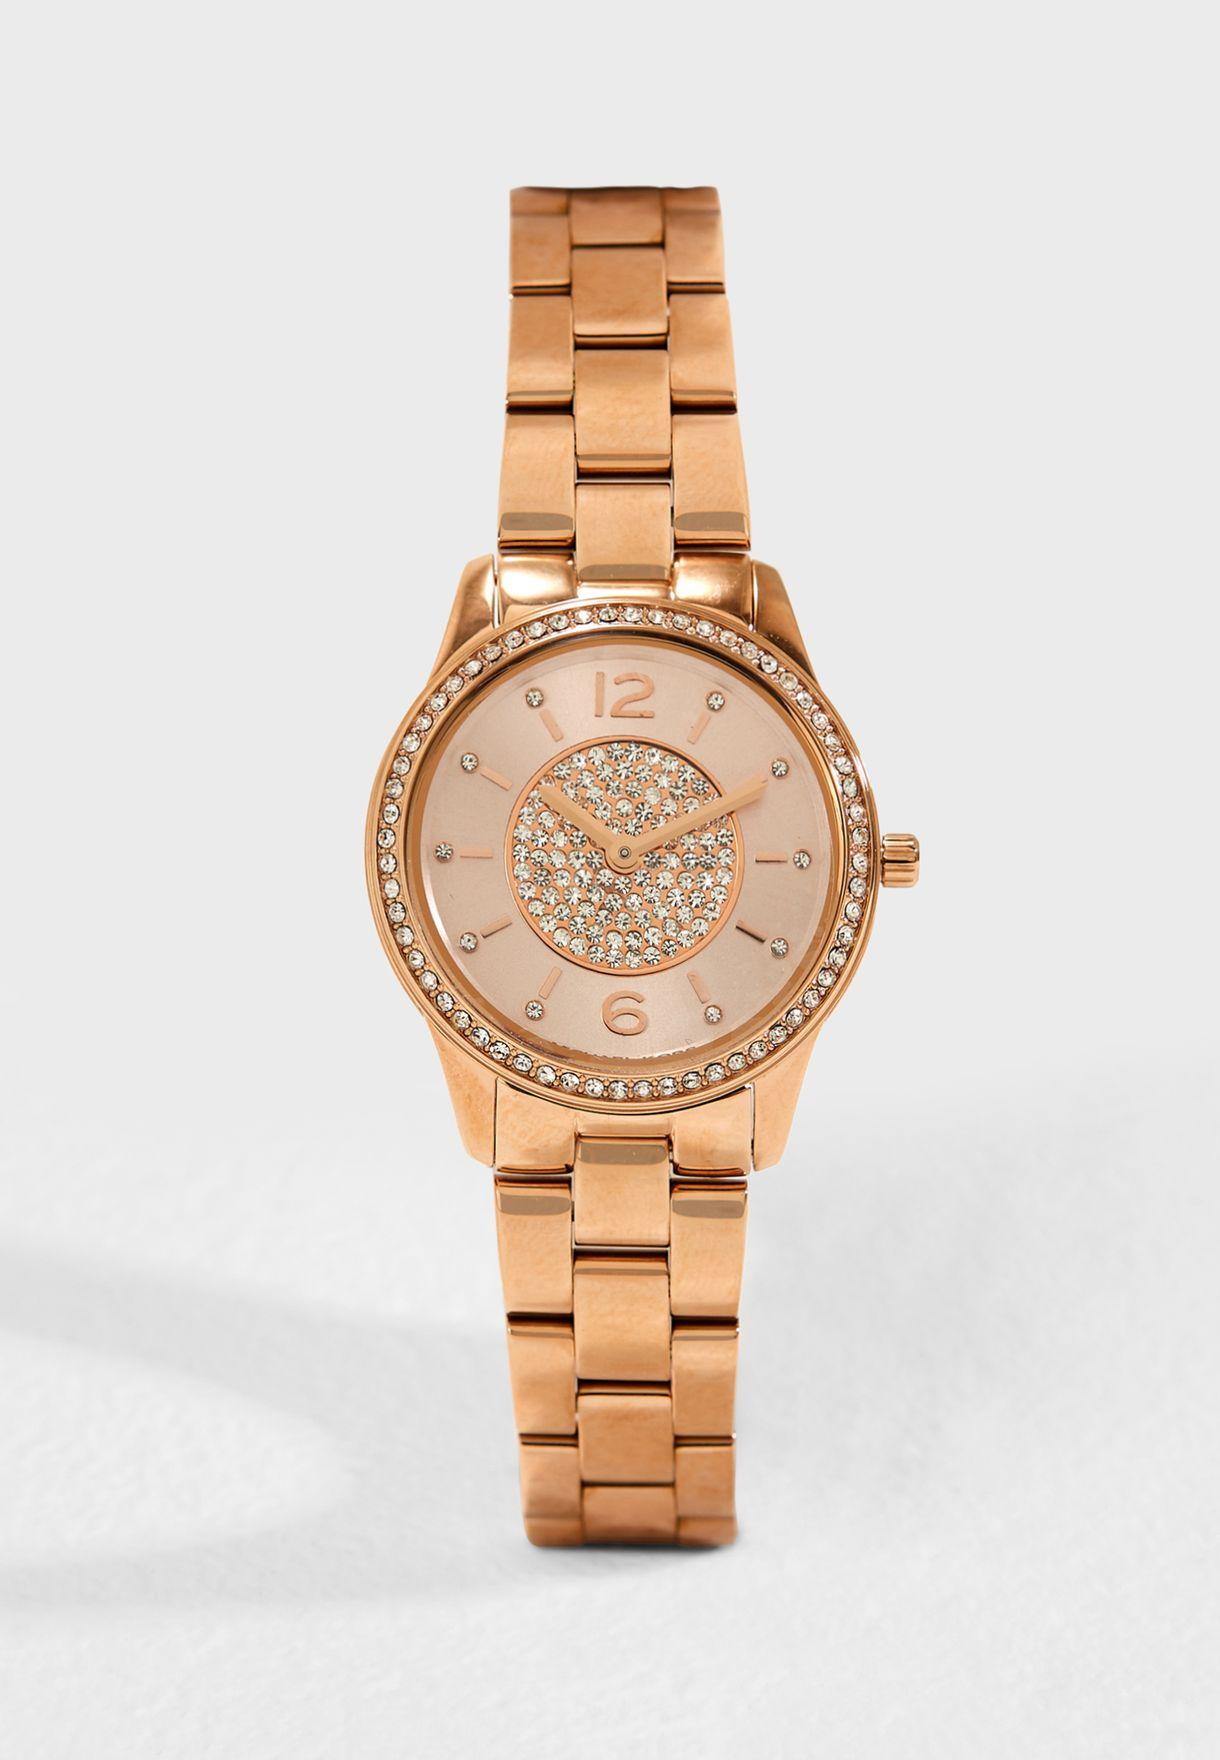 78442a1c1312 Shop Michael Kors rosegold MK6619 Runway Jetset Watch MK6619 for ...